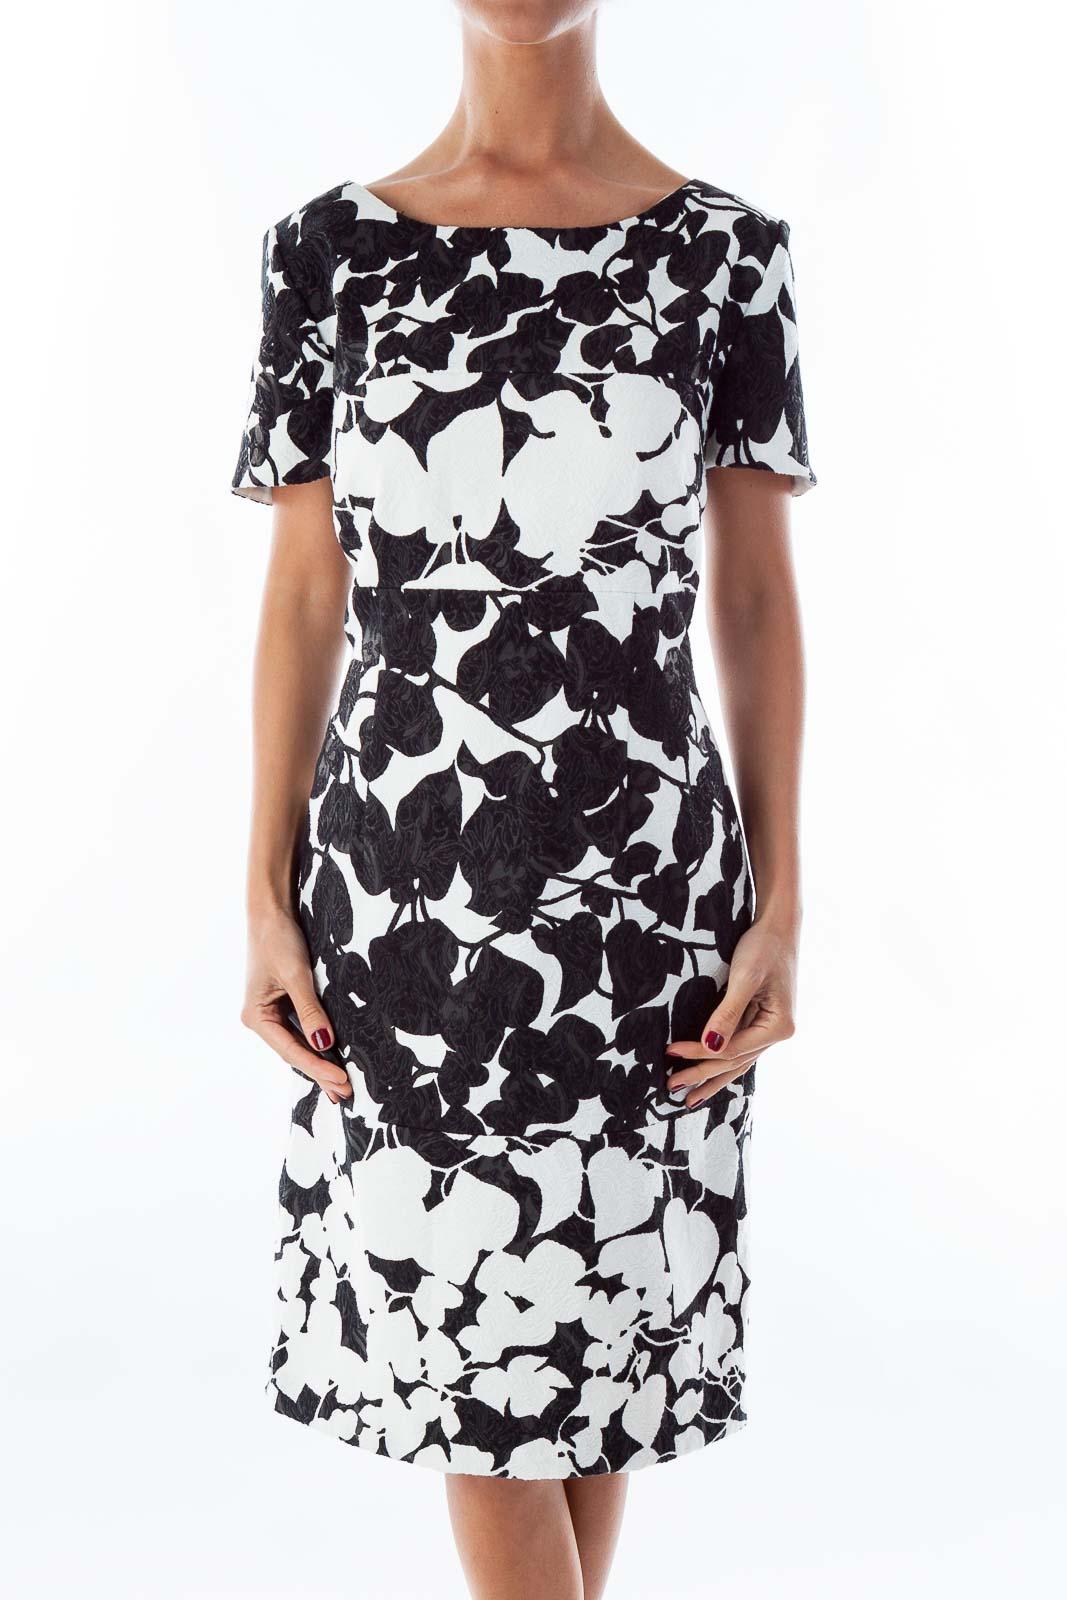 Black & White Floral Dress Front